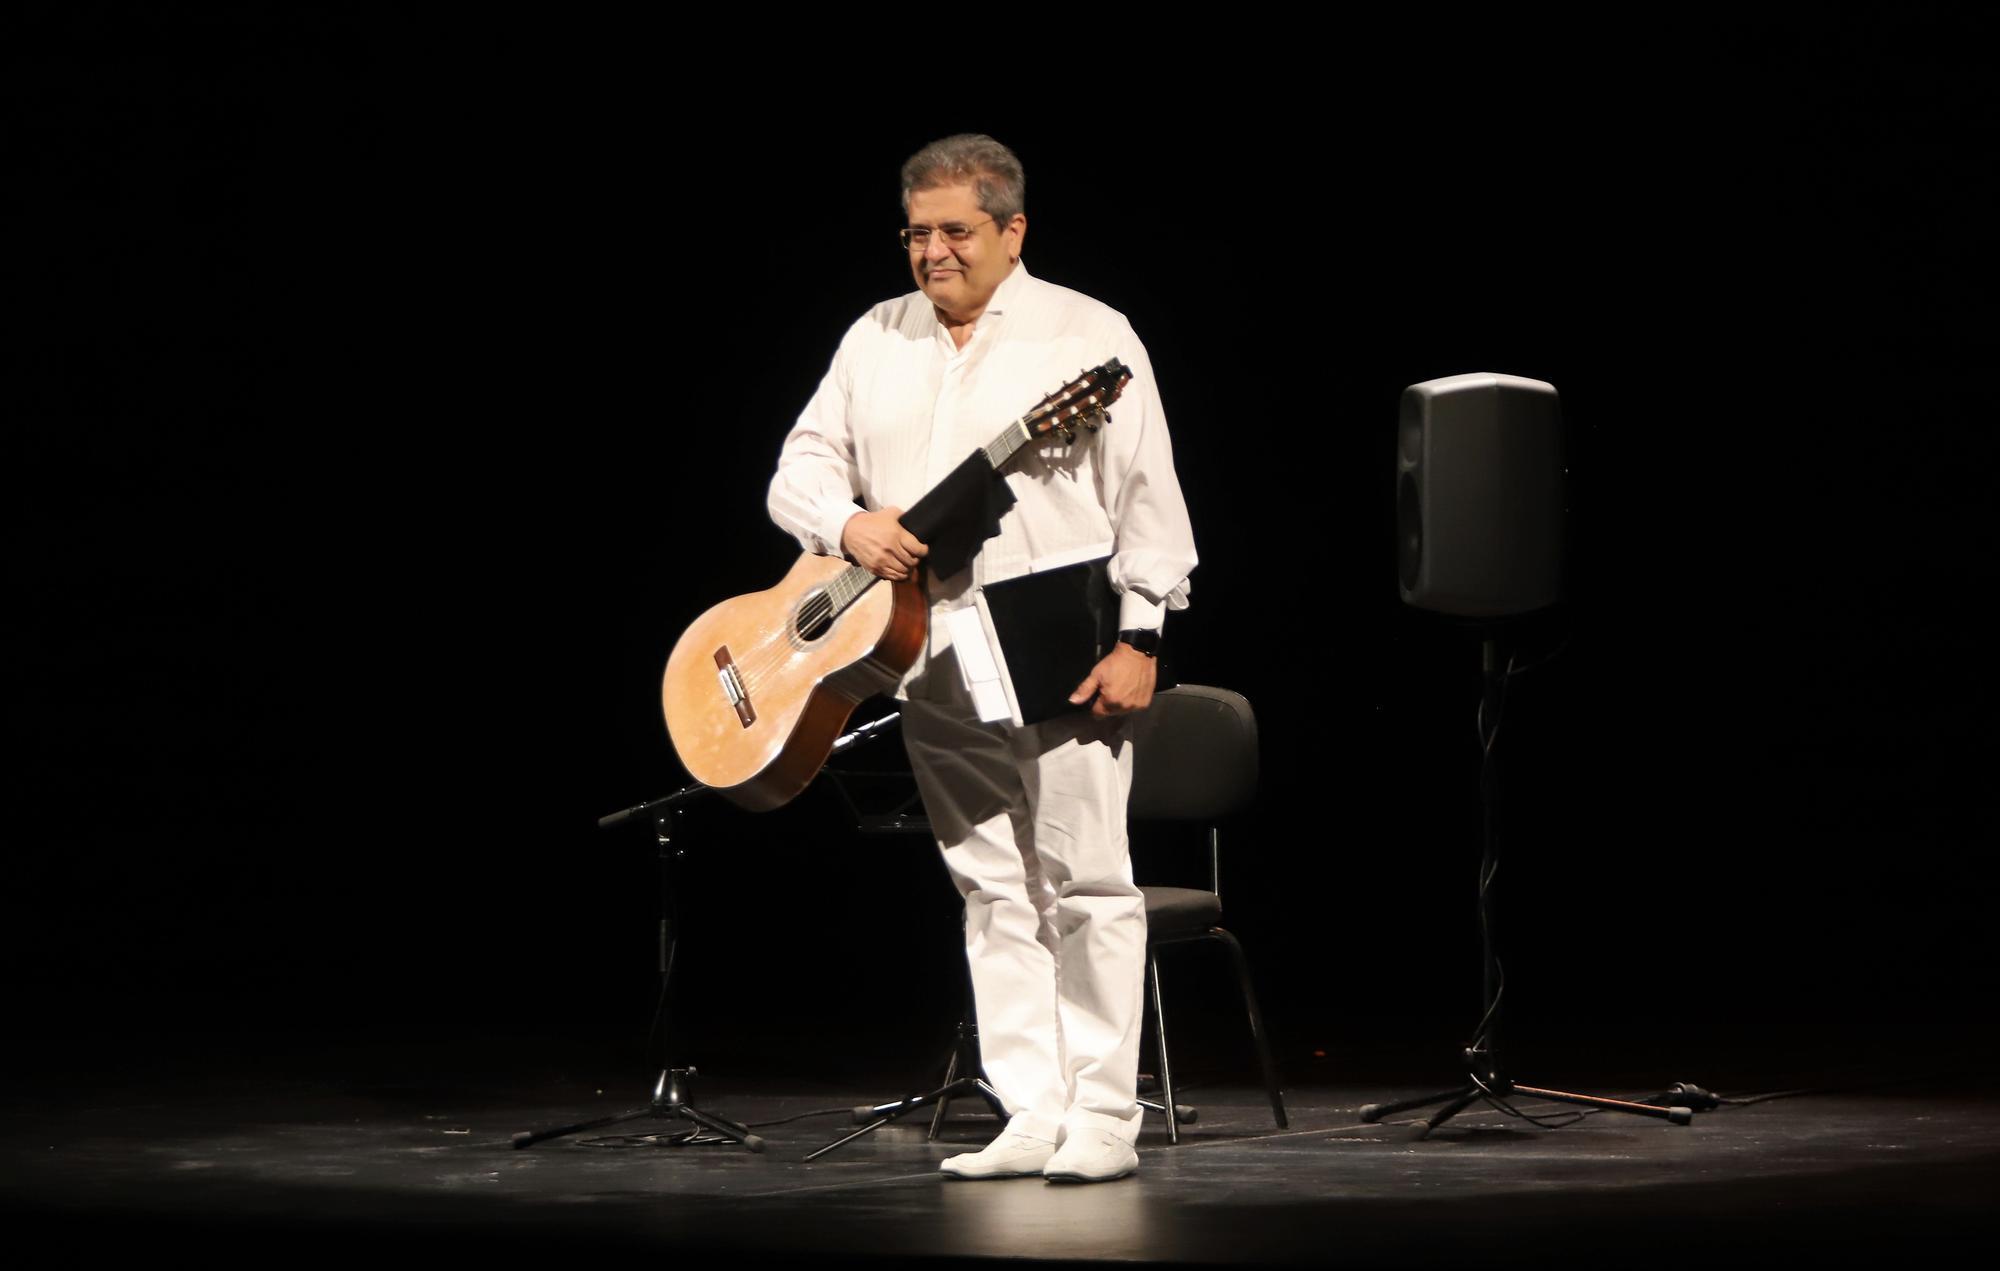 Las imágenes de la septima jornada del Festival de la Guitarra